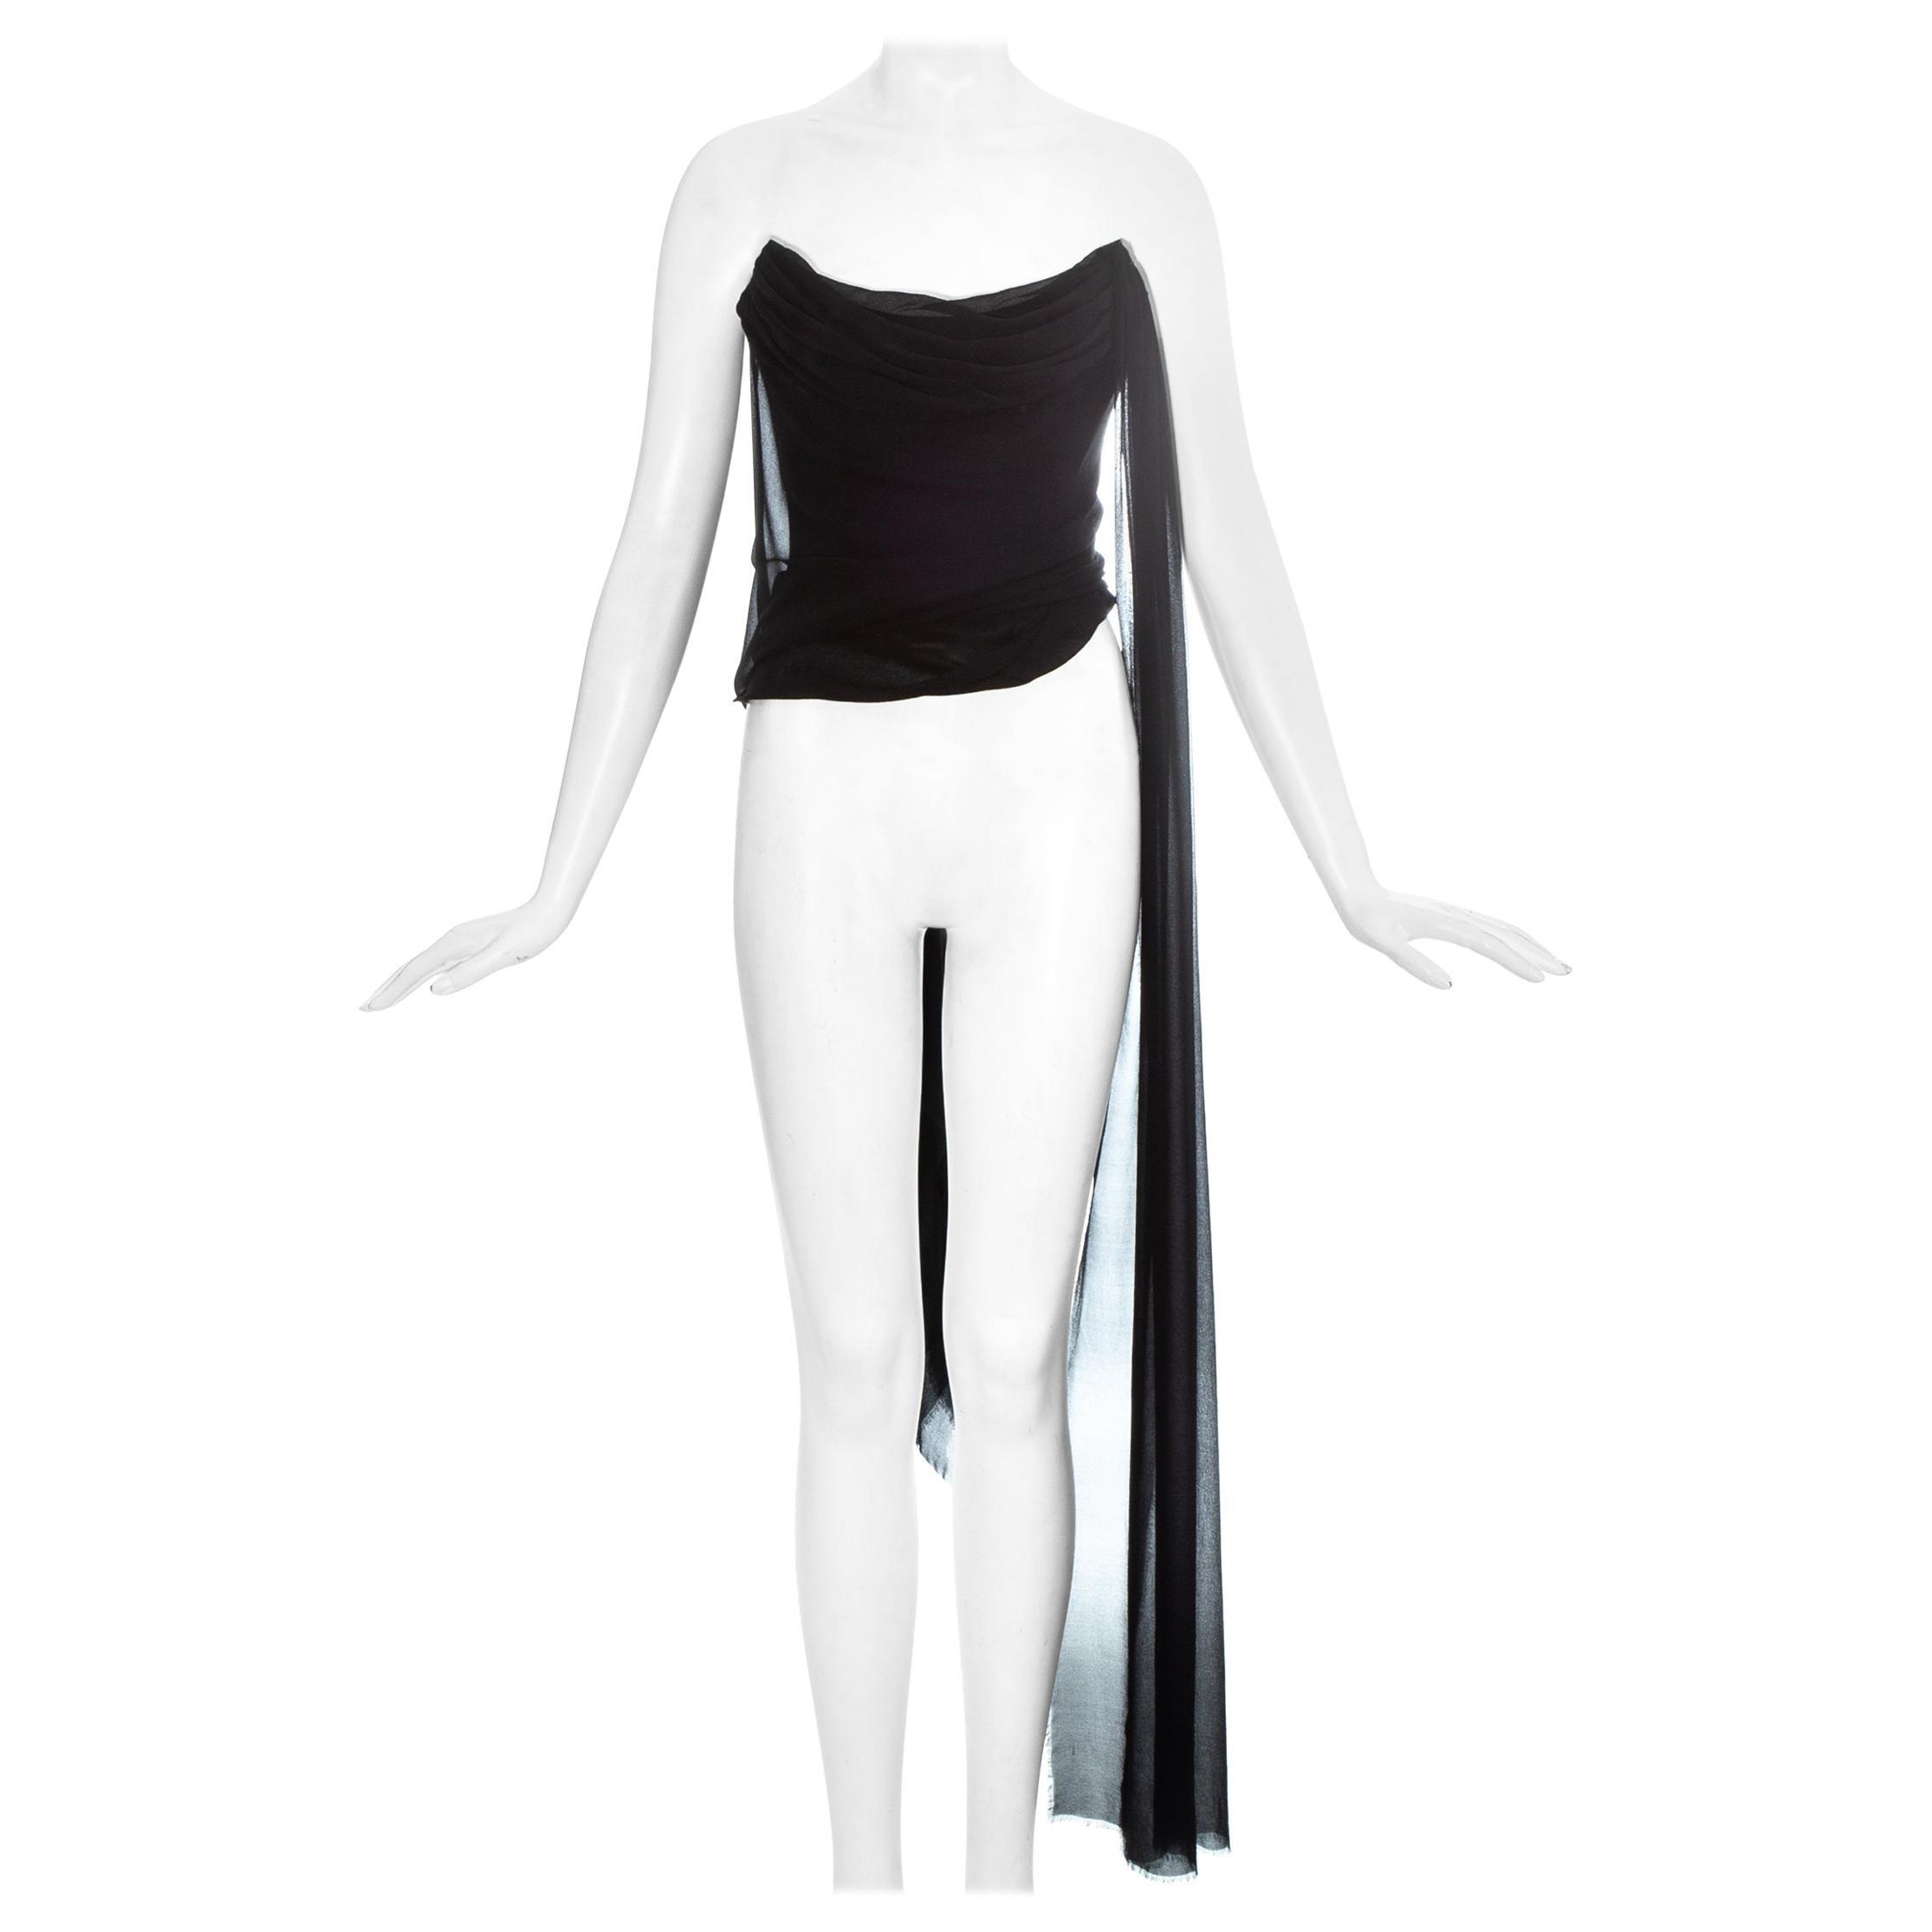 Vivienne Westwood black silk chiffon draped corset, 1990s